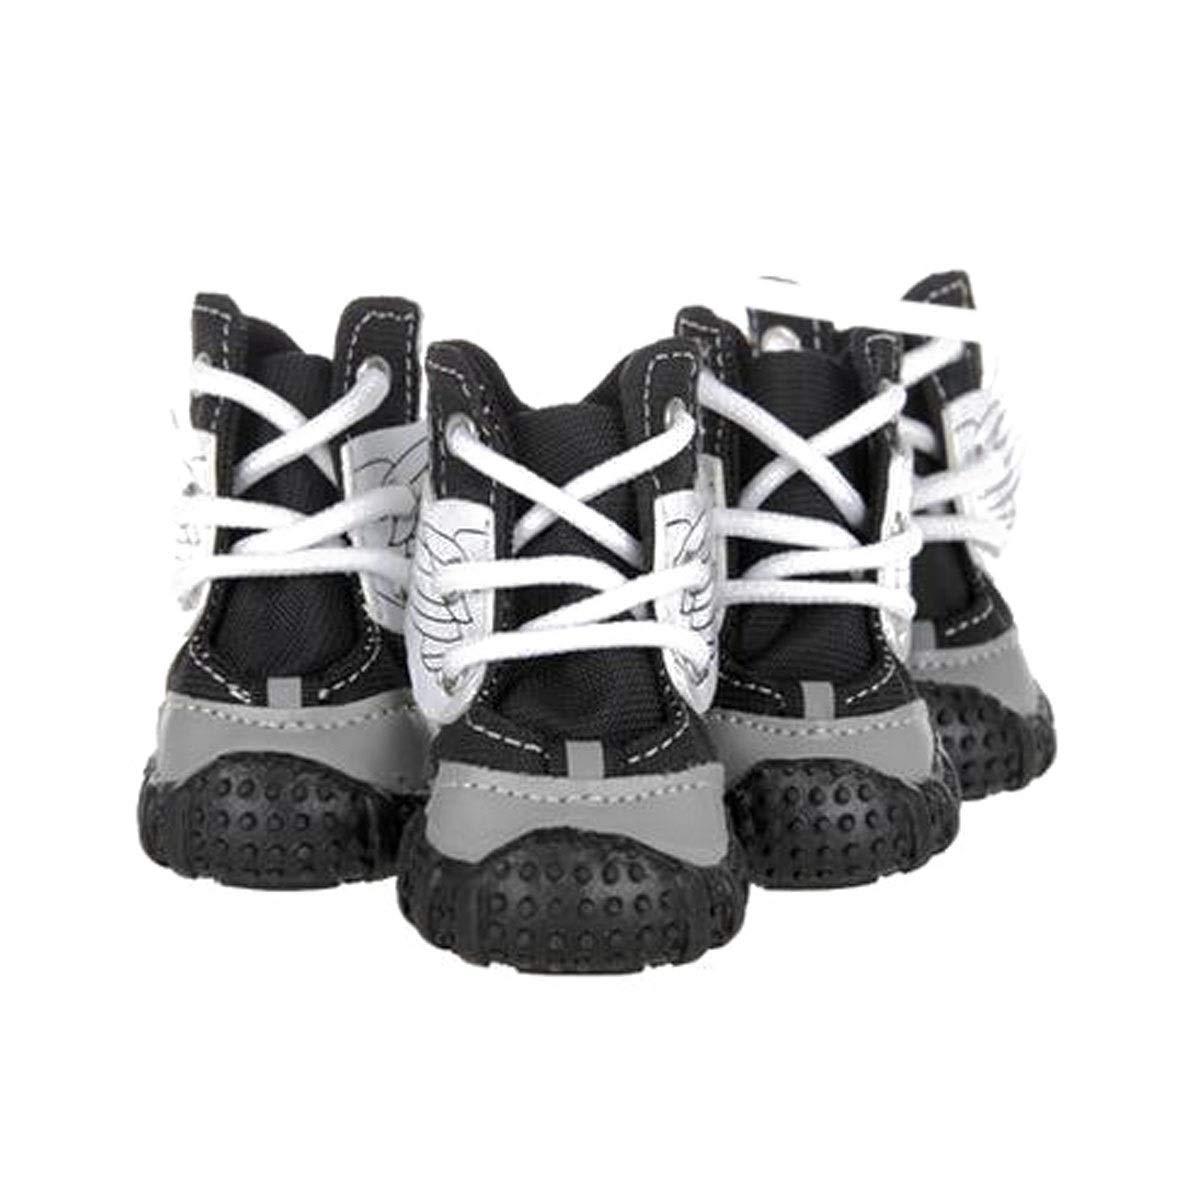 Black 5  Black 5  Dog shoes, Dog Rain Boots, Medium Dog Waterproof shoes, Puppy Hiking shoes, Pet Supplies, Black, Red (1 -5 ) (color   Black, Size   5 )